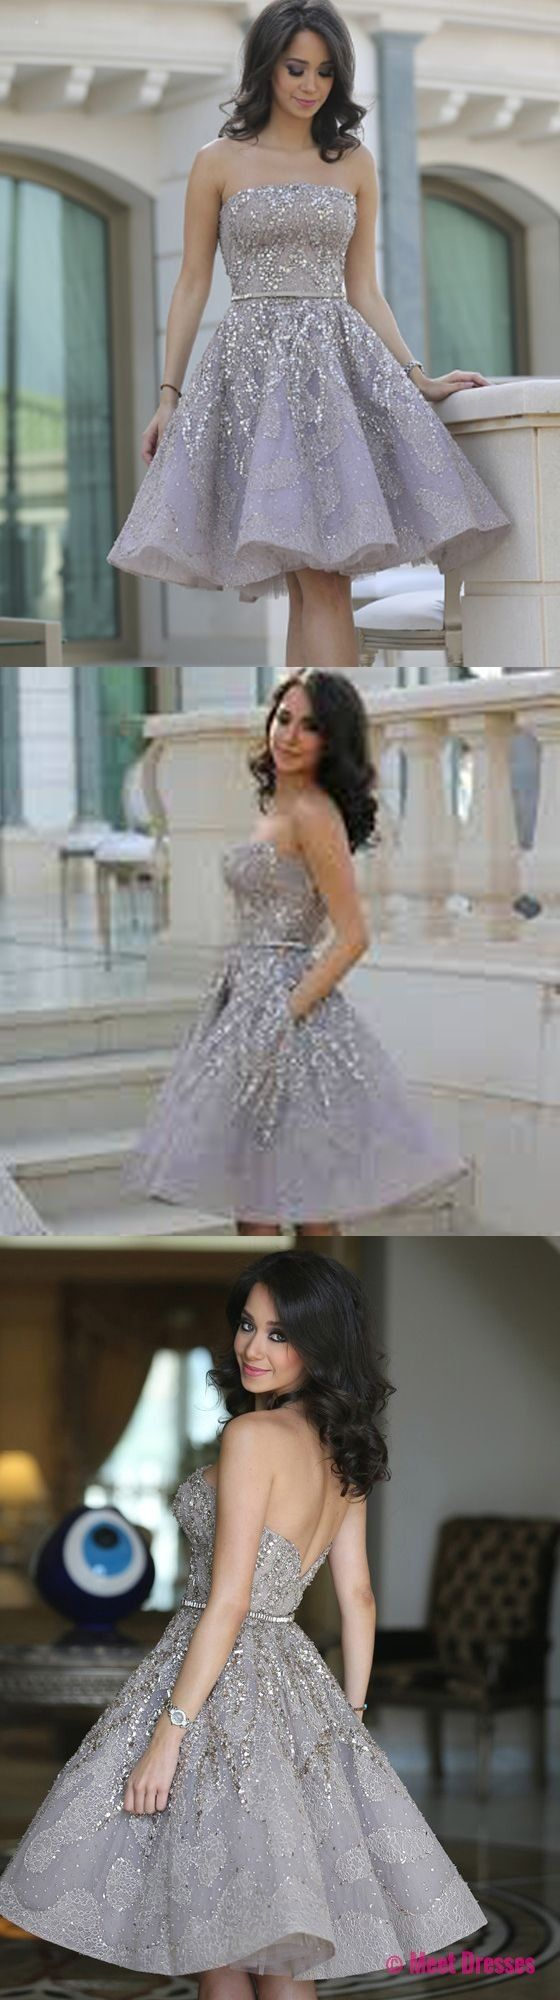 Homecoming dresseselegant homecoming dresseshomecoming dresses